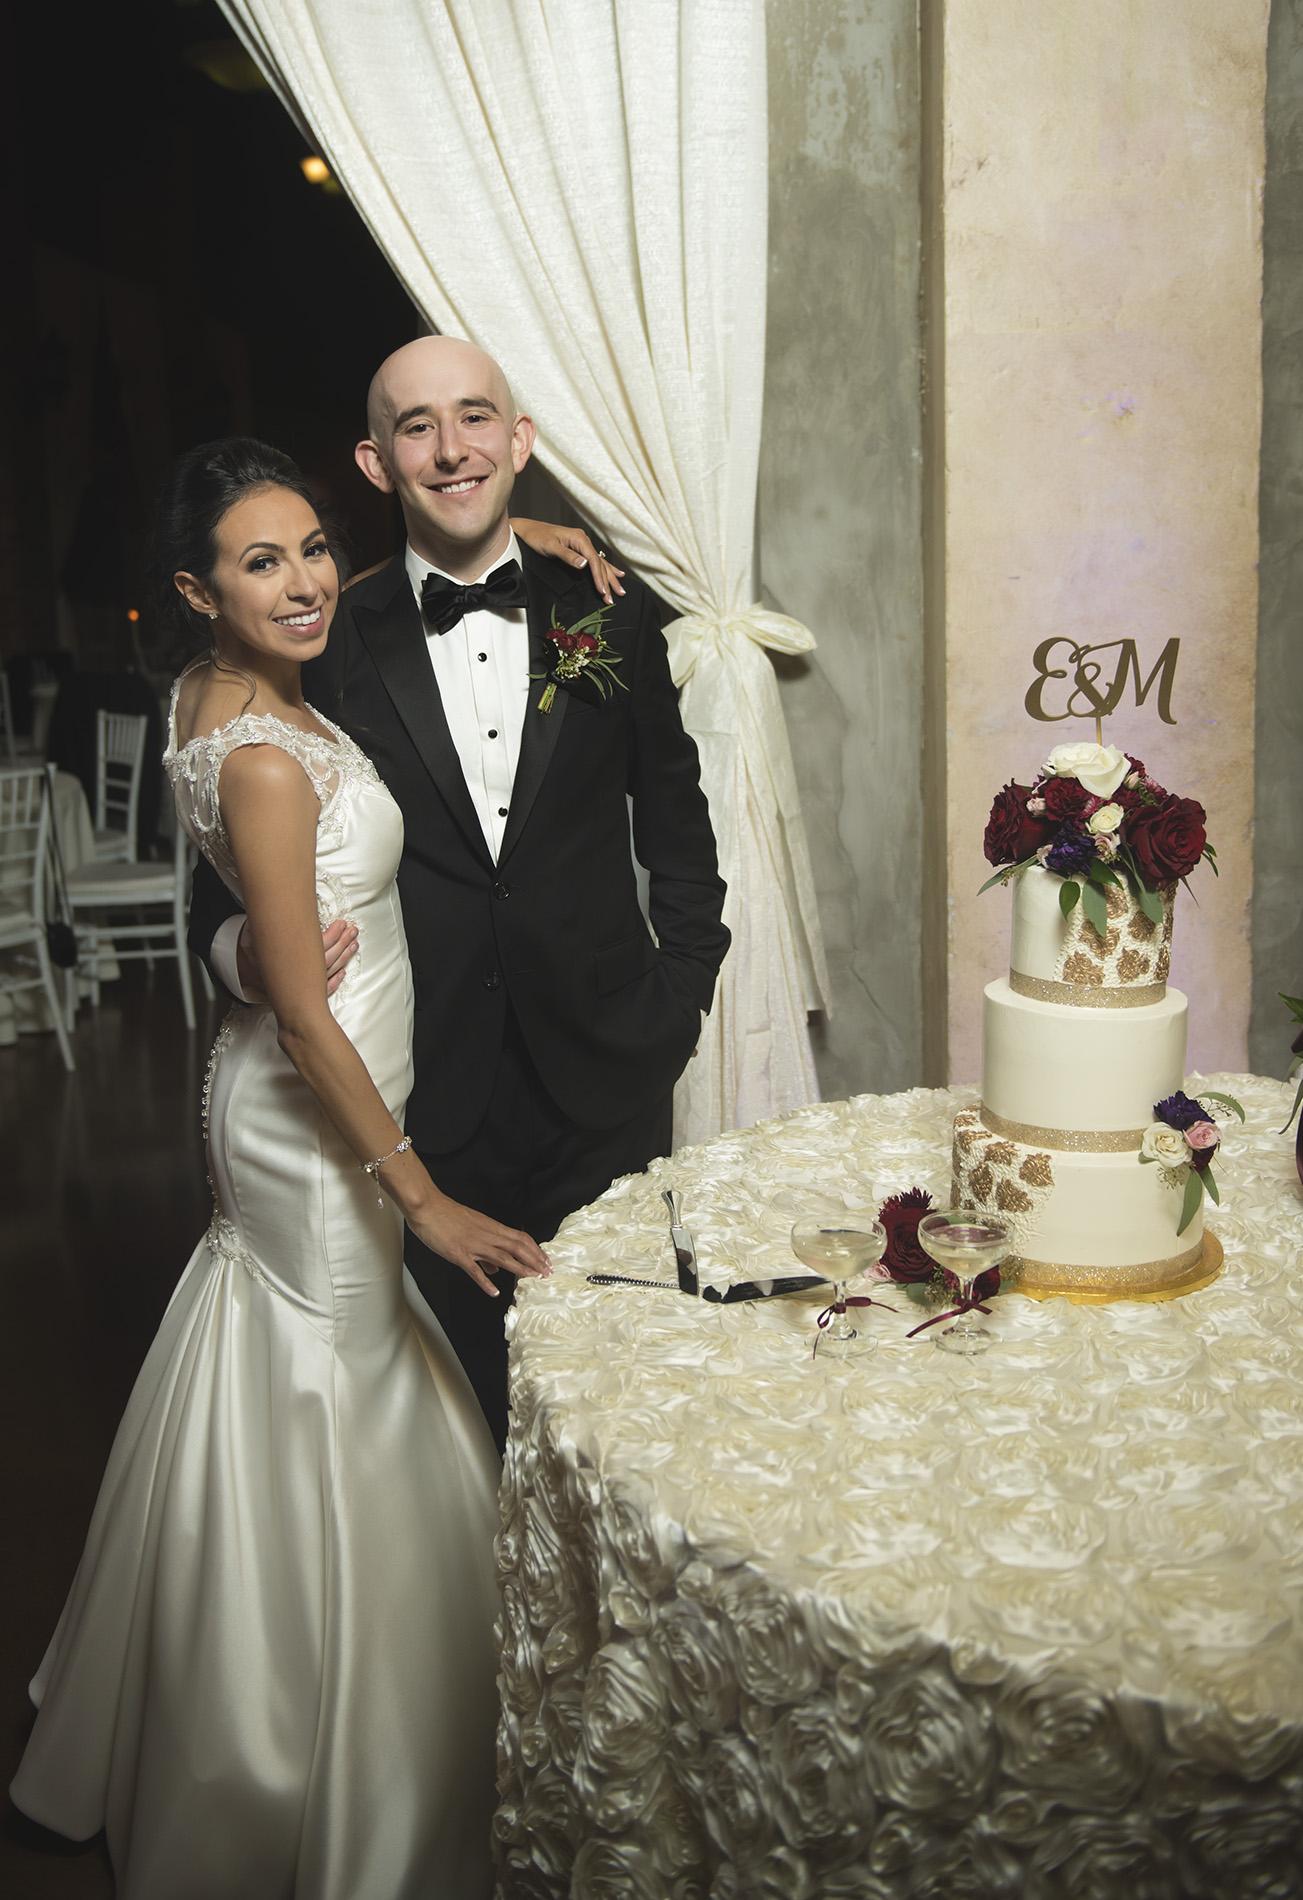 Houston-venue-Olde-Dobbin-Station-Romantic-Classic-Wedding-Photographer-104.jpg